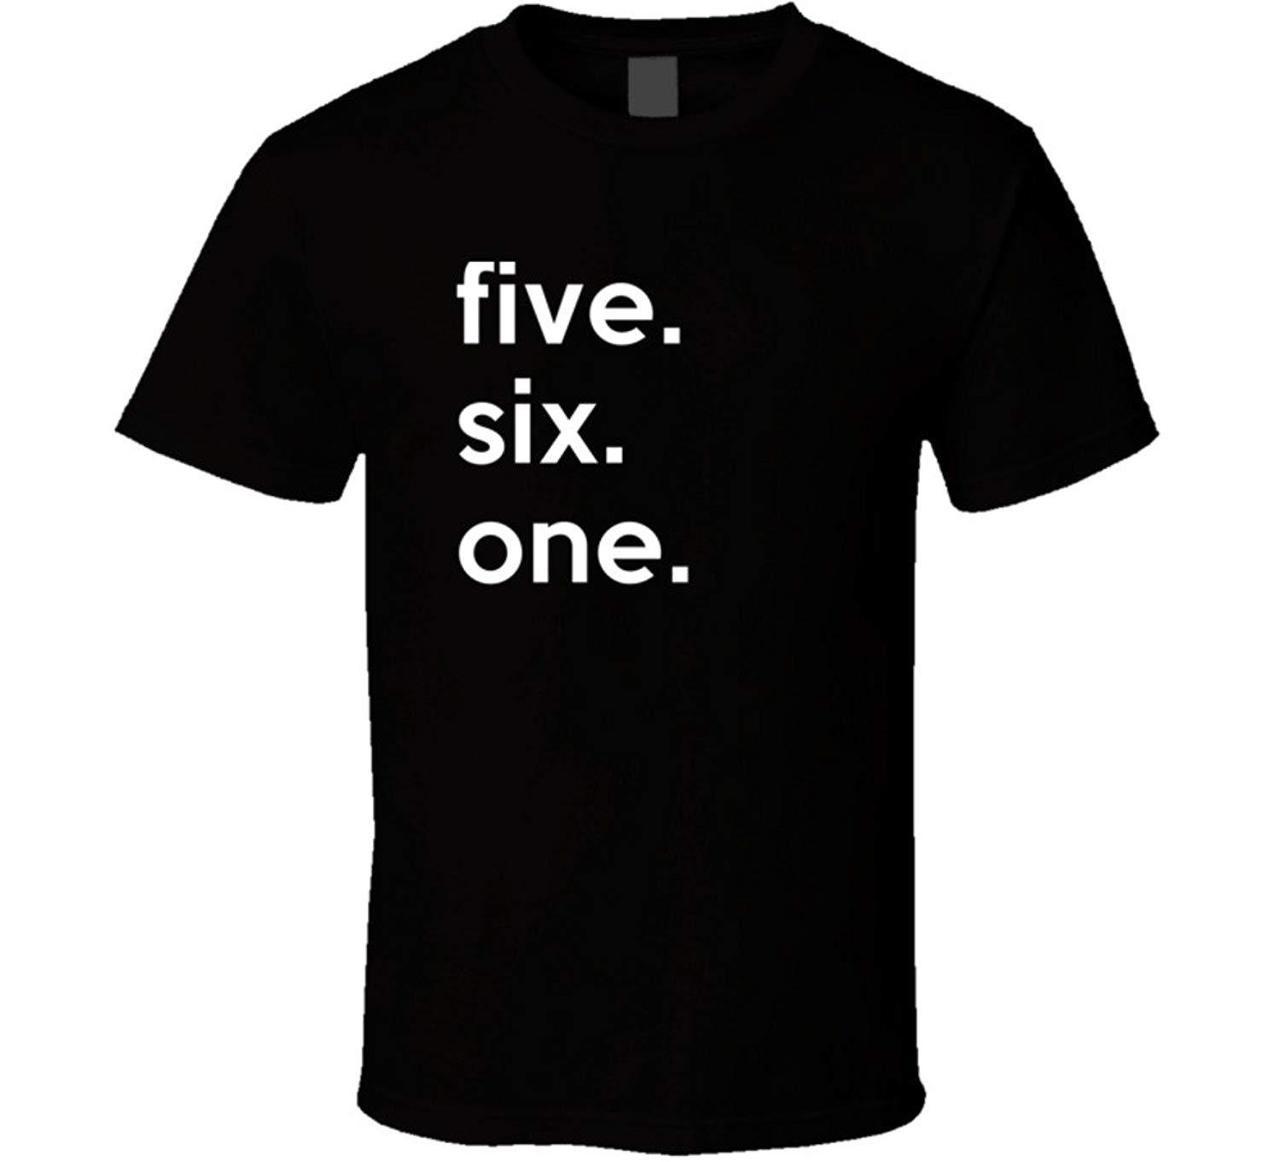 Florida 561 Trending Area Code Pride T Shirt